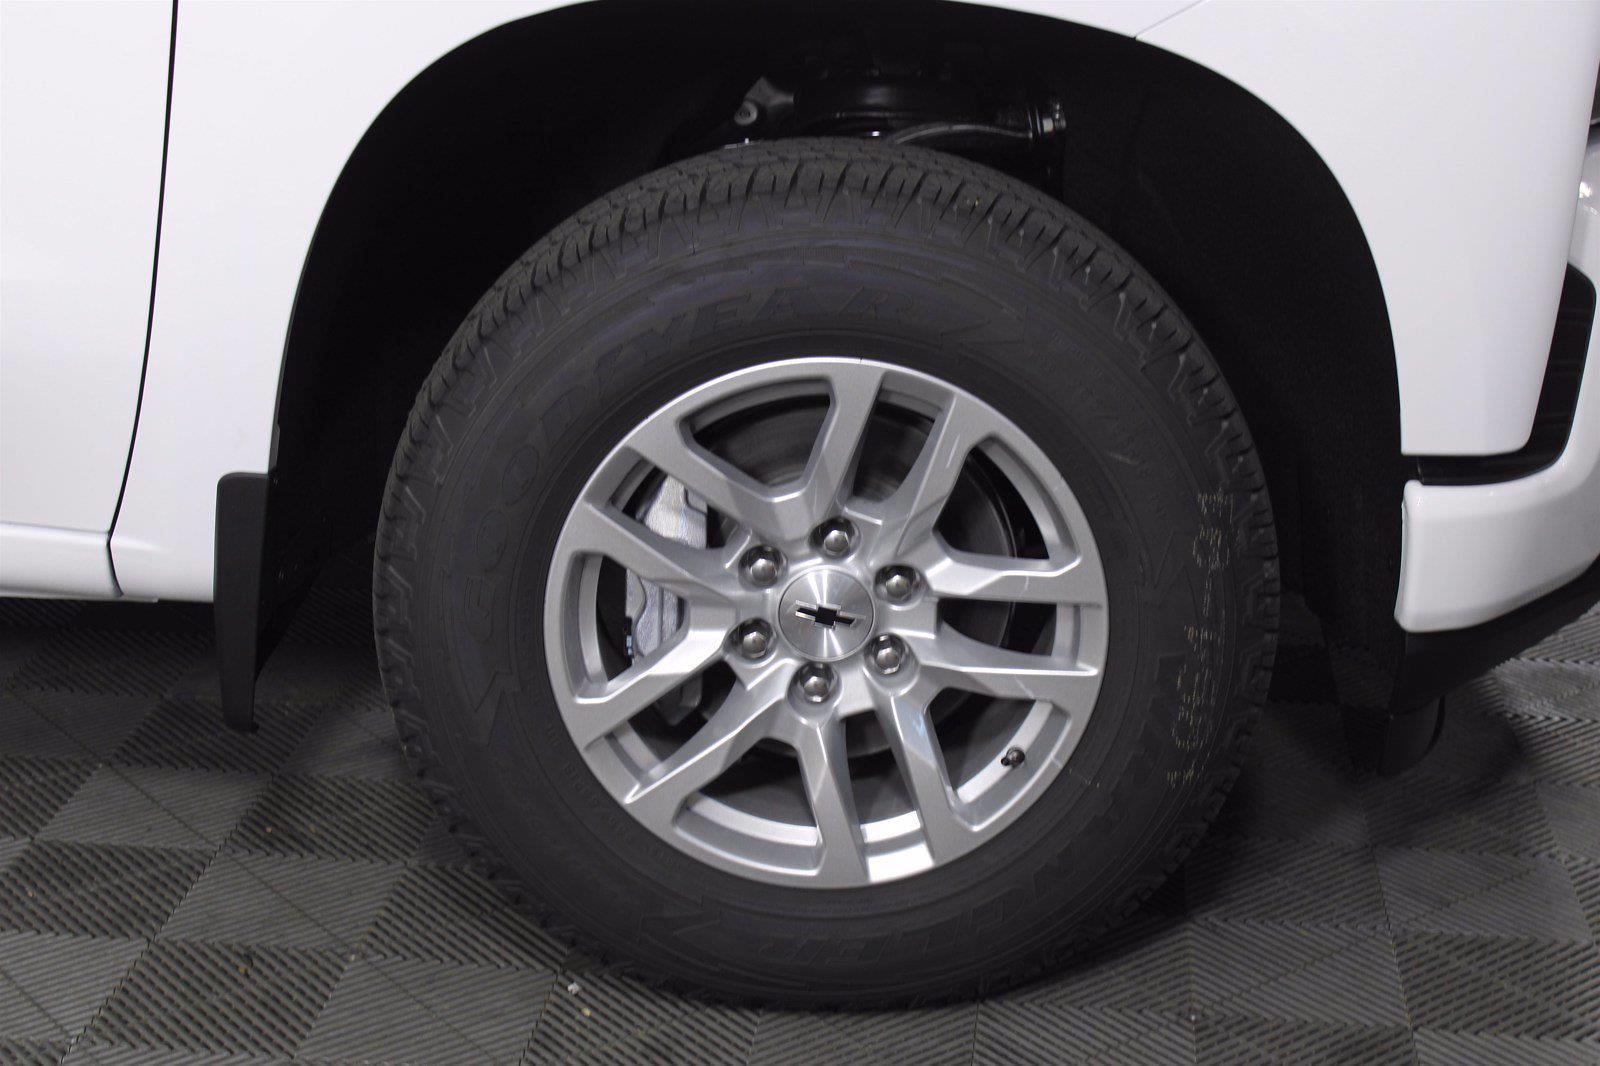 2021 Chevrolet Silverado 1500 Crew Cab 4x4, Pickup #D111144 - photo 6